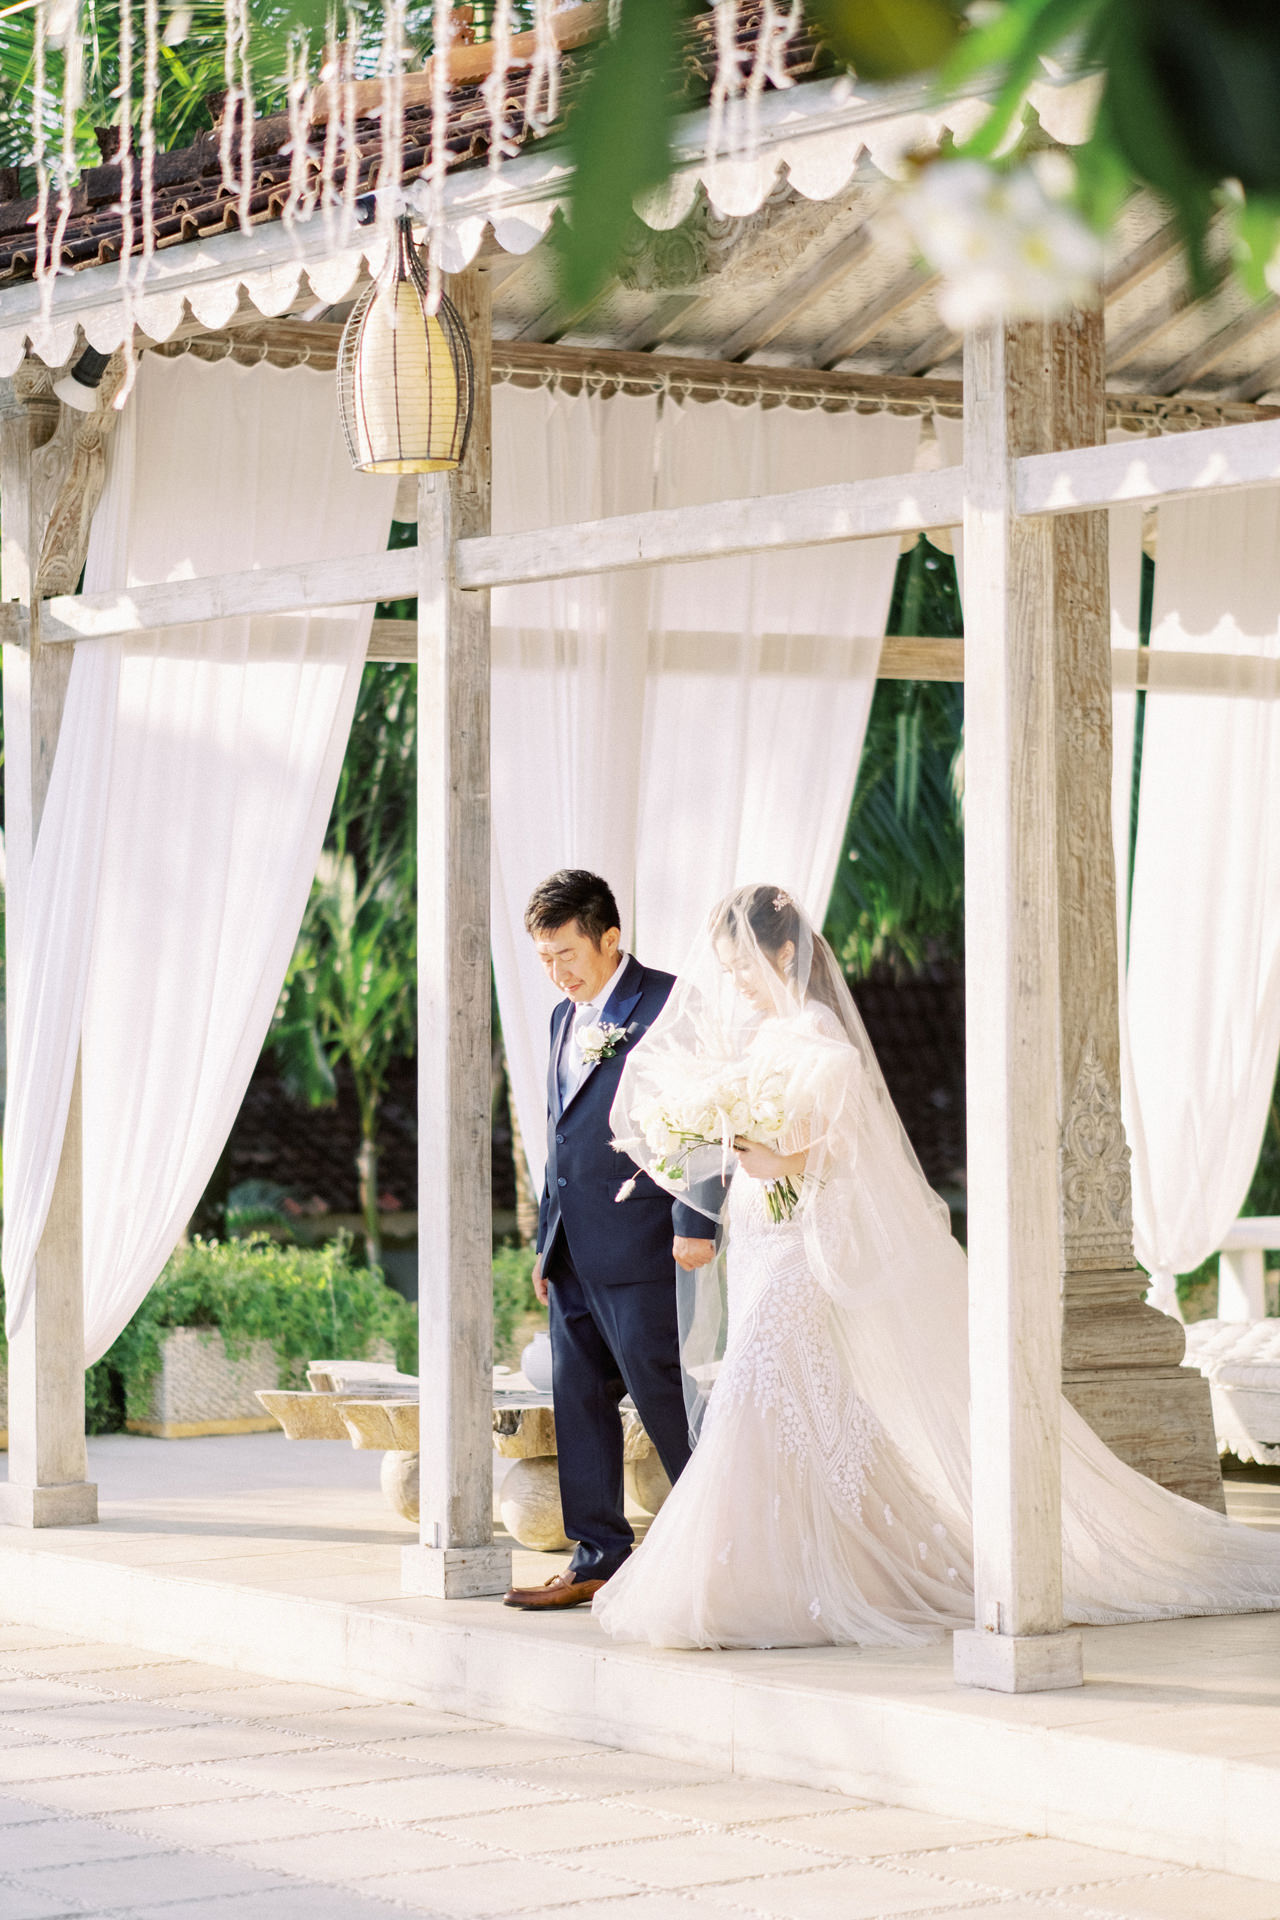 M&S: Shades of Blue Villa Plenilunio Bali Wedding 58